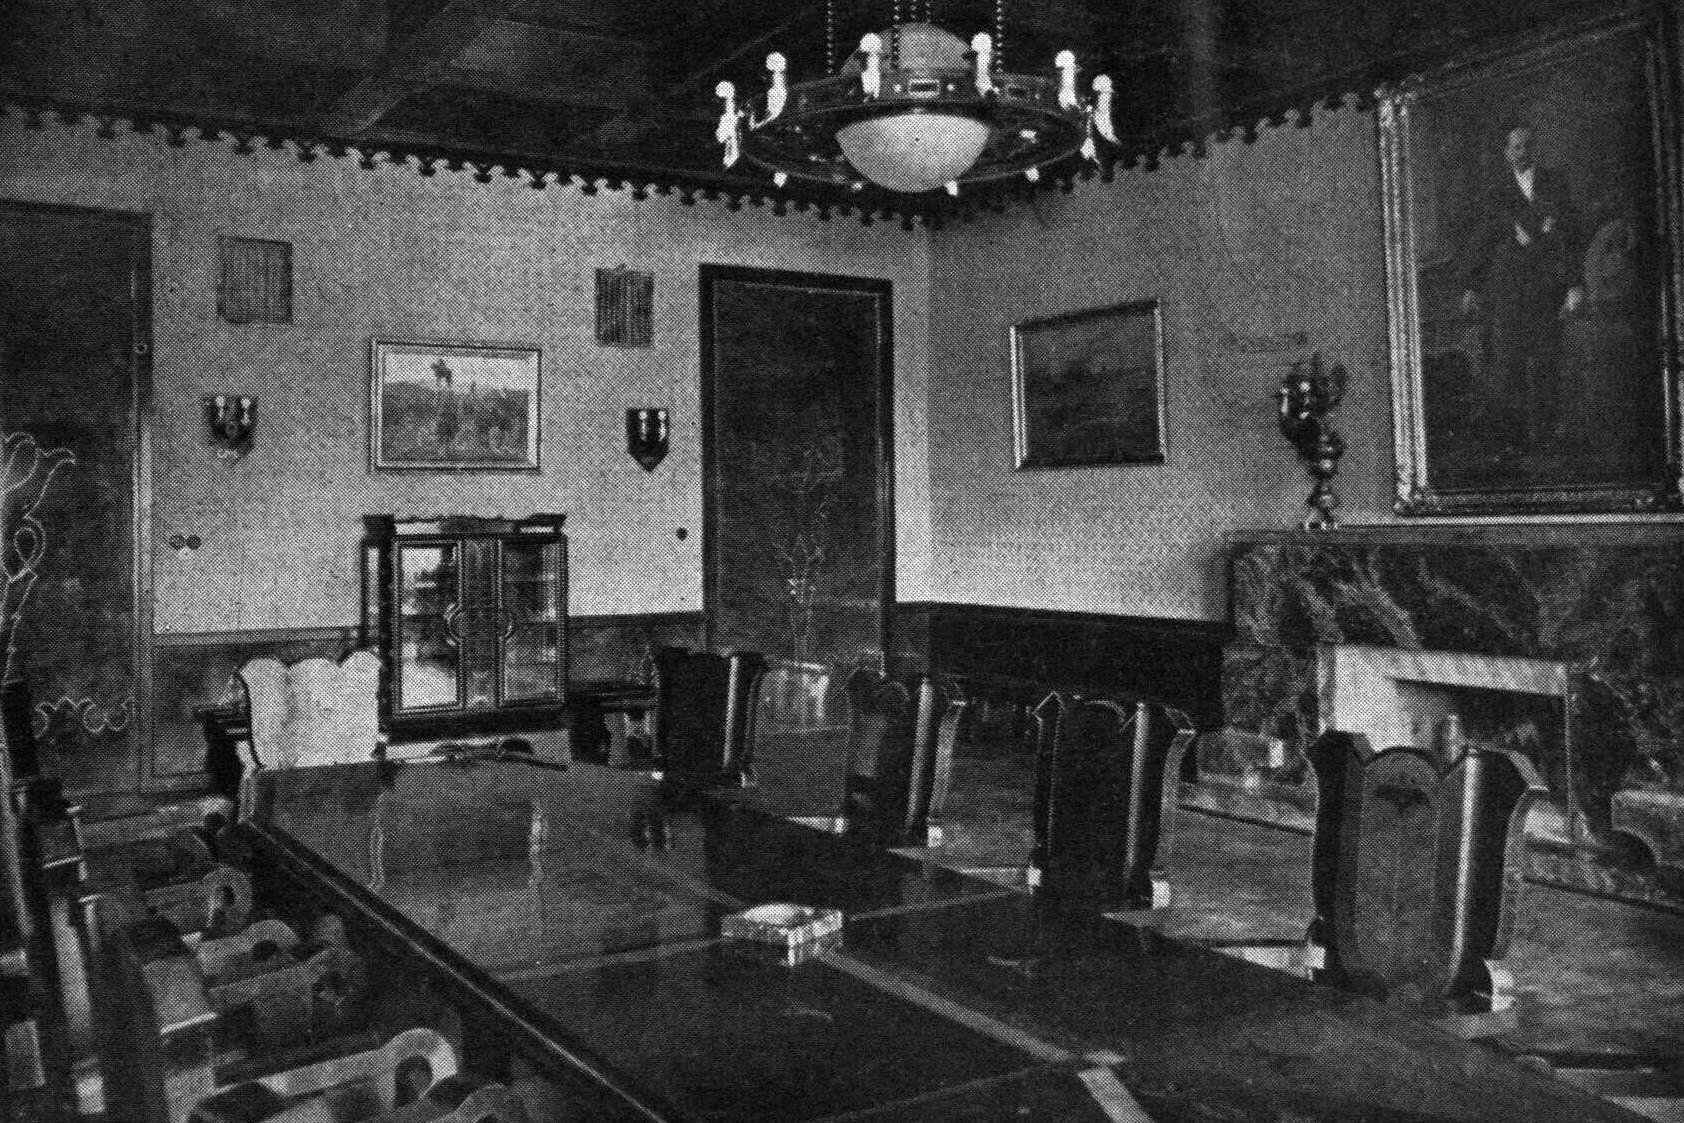 ramove kardas 1937 nr 9 prezidento kambarys apkarpyta